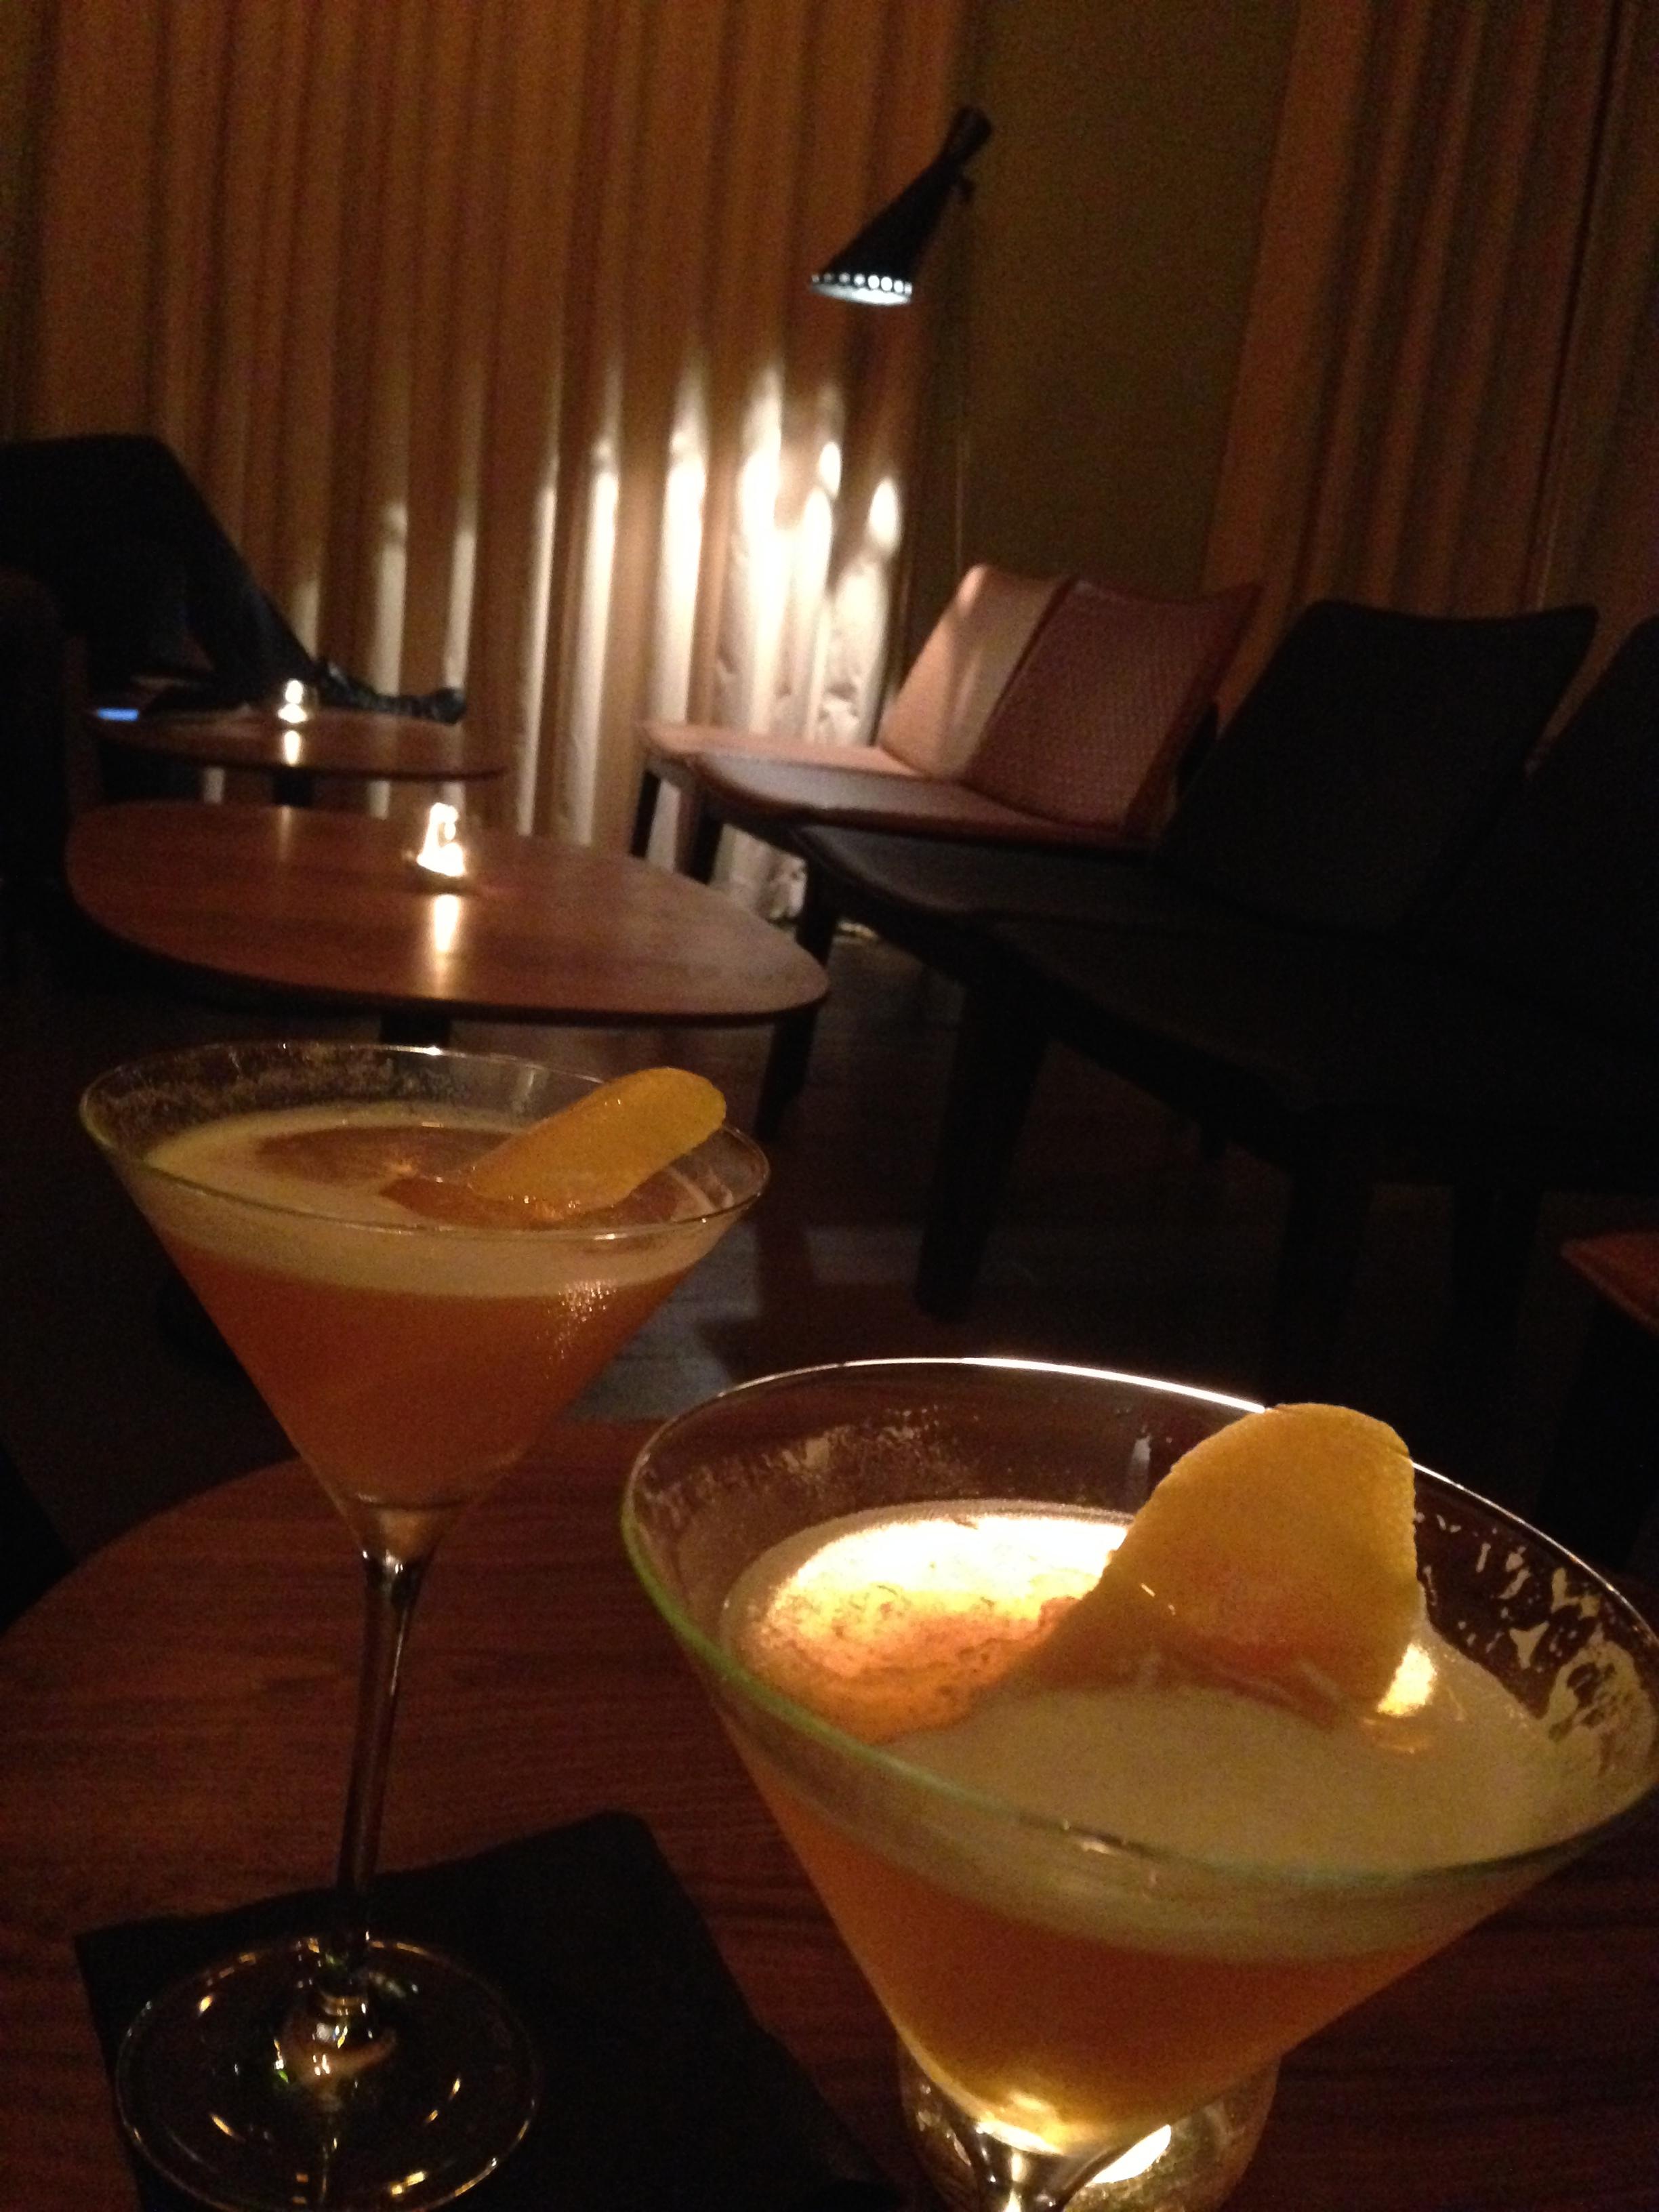 La maison r my martin private members club cognac expert for A la maison personal chef service